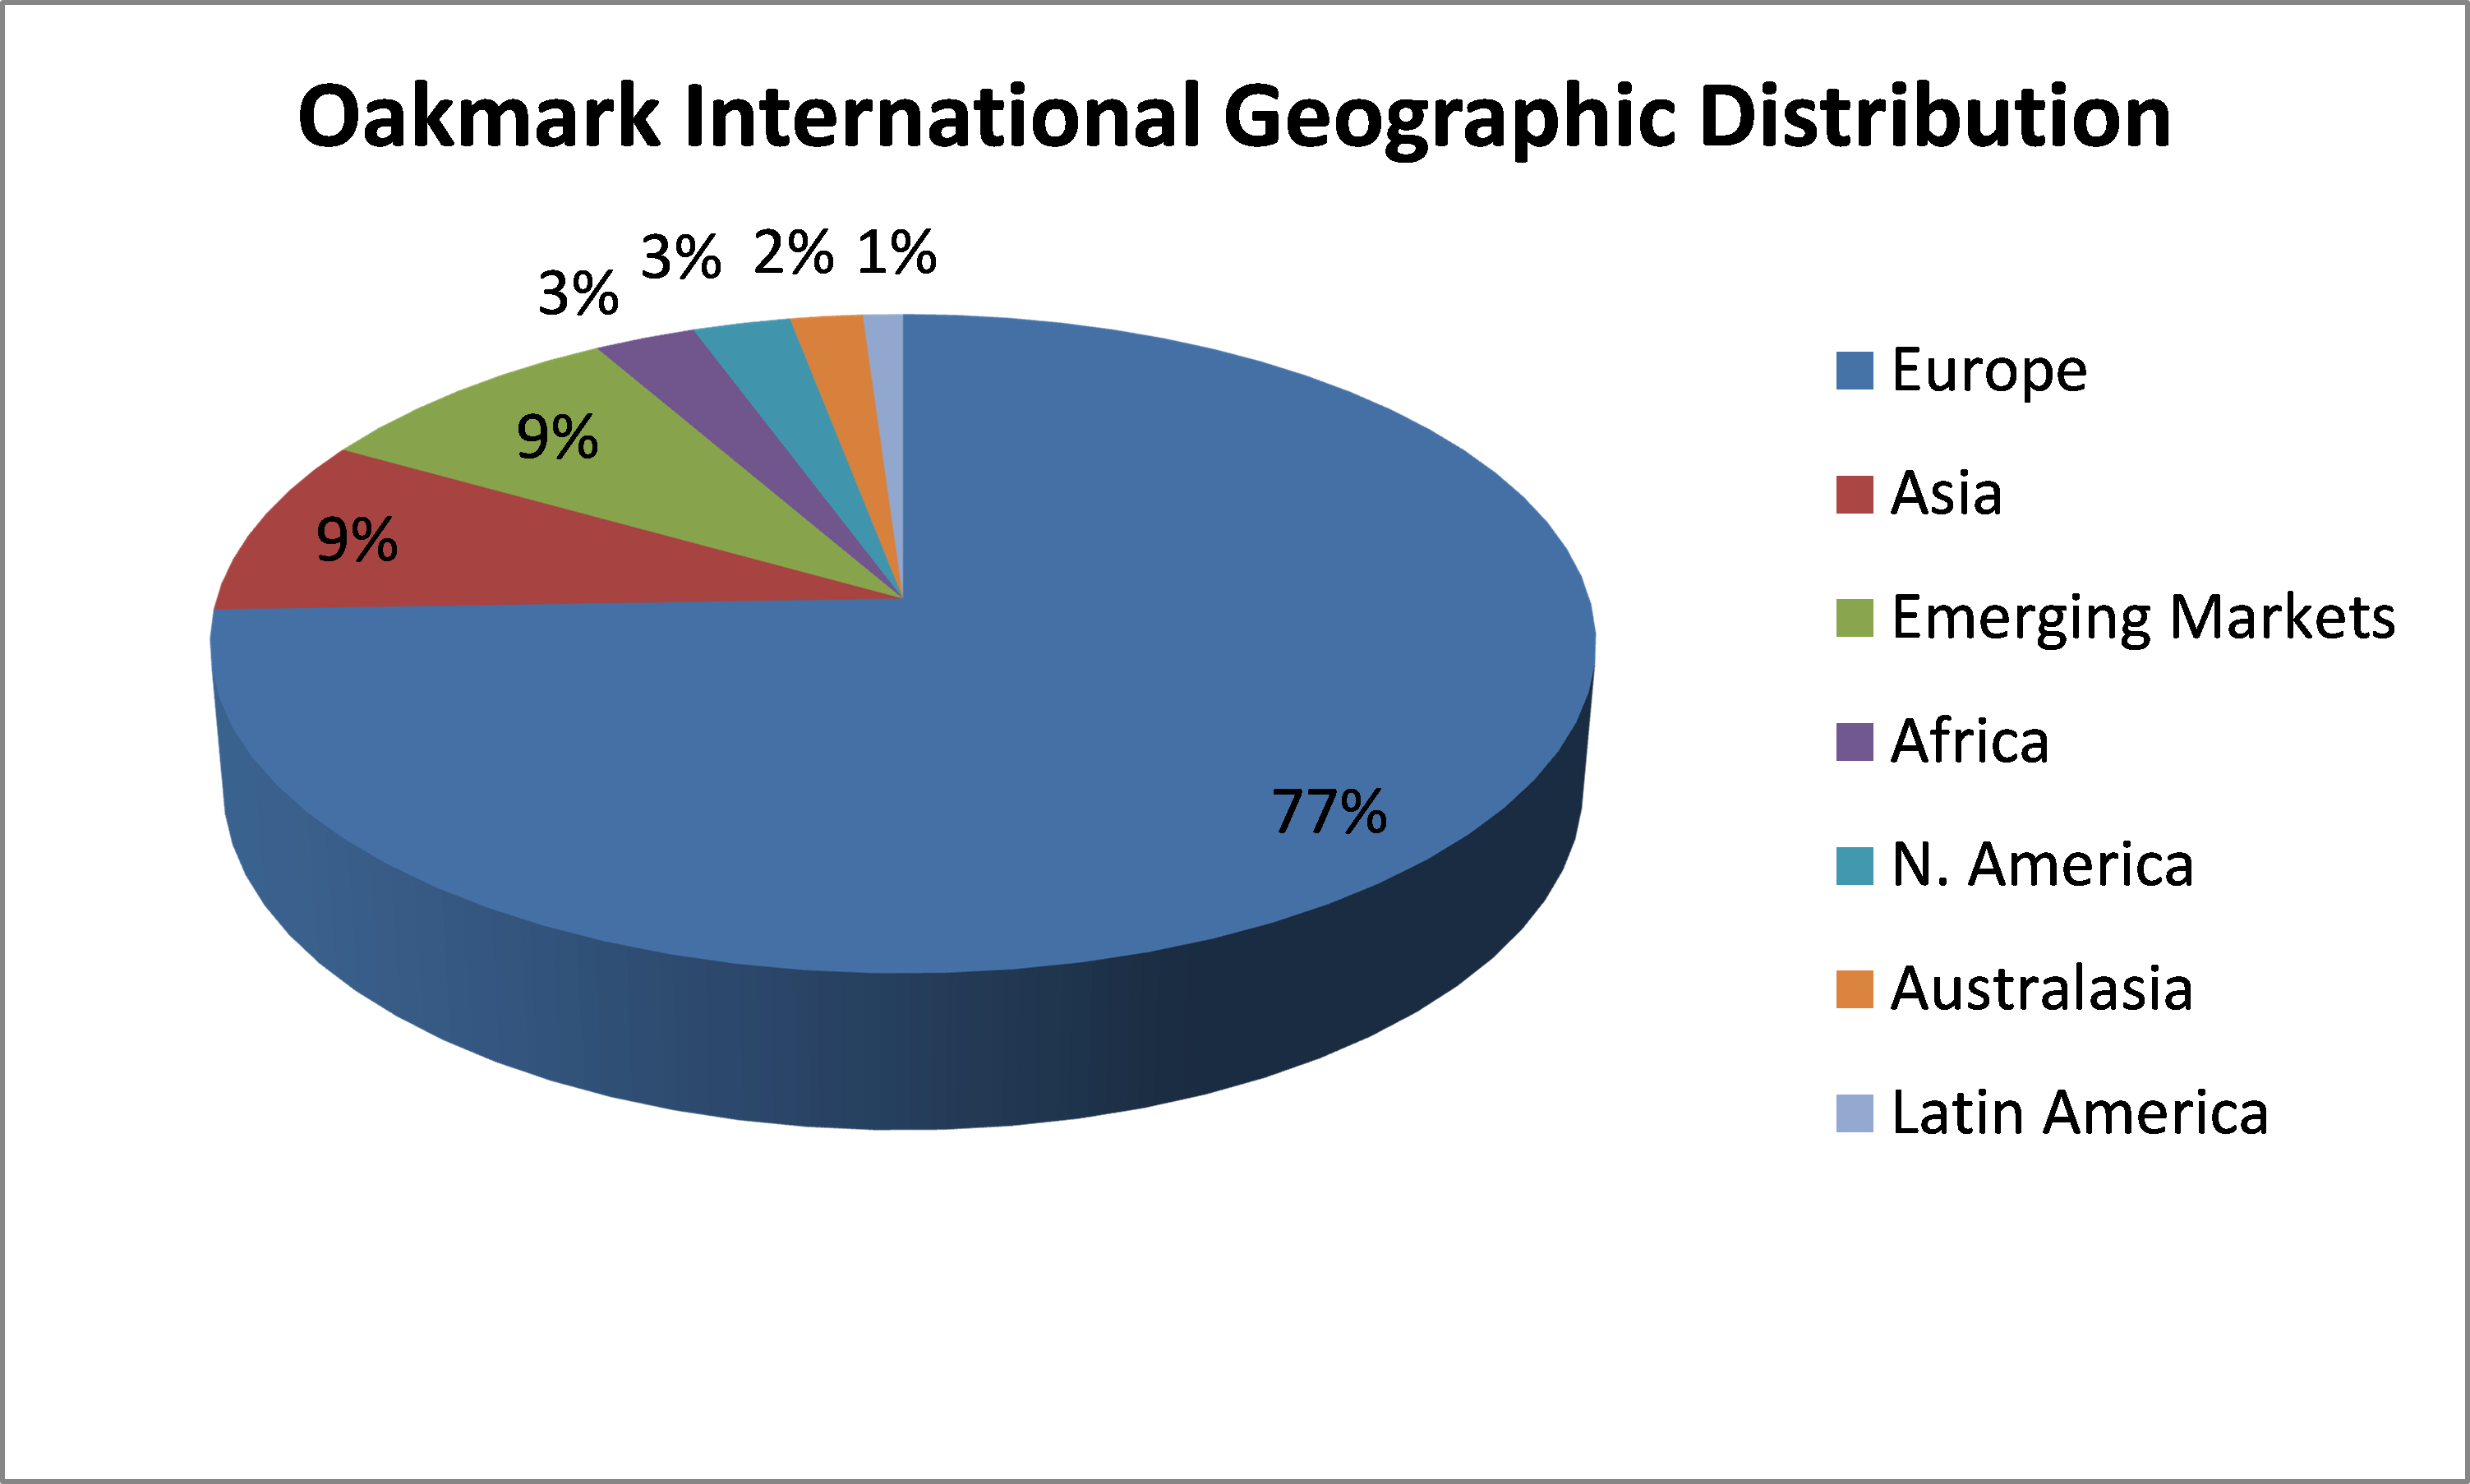 Oakmark International Geographic Distribution